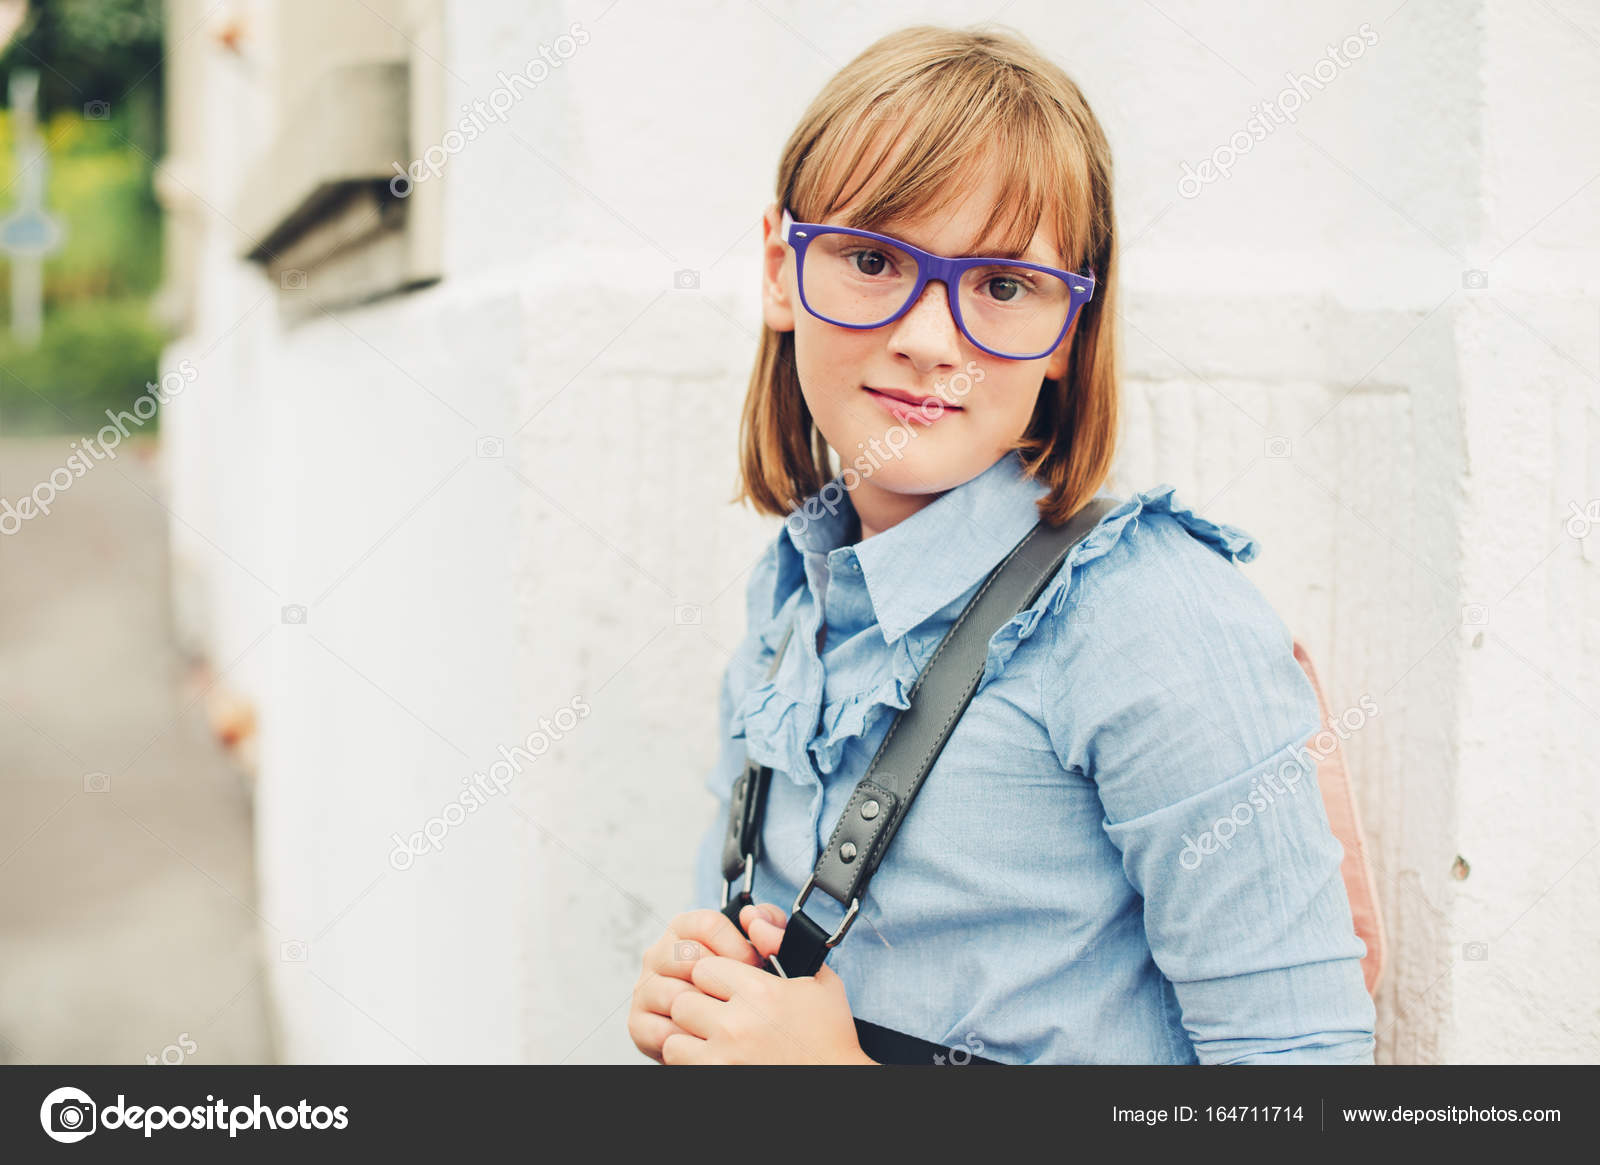 d333eab64e3e Outdoor portrait of a cute little 9-10 year old girl wearing blue uniform  dress